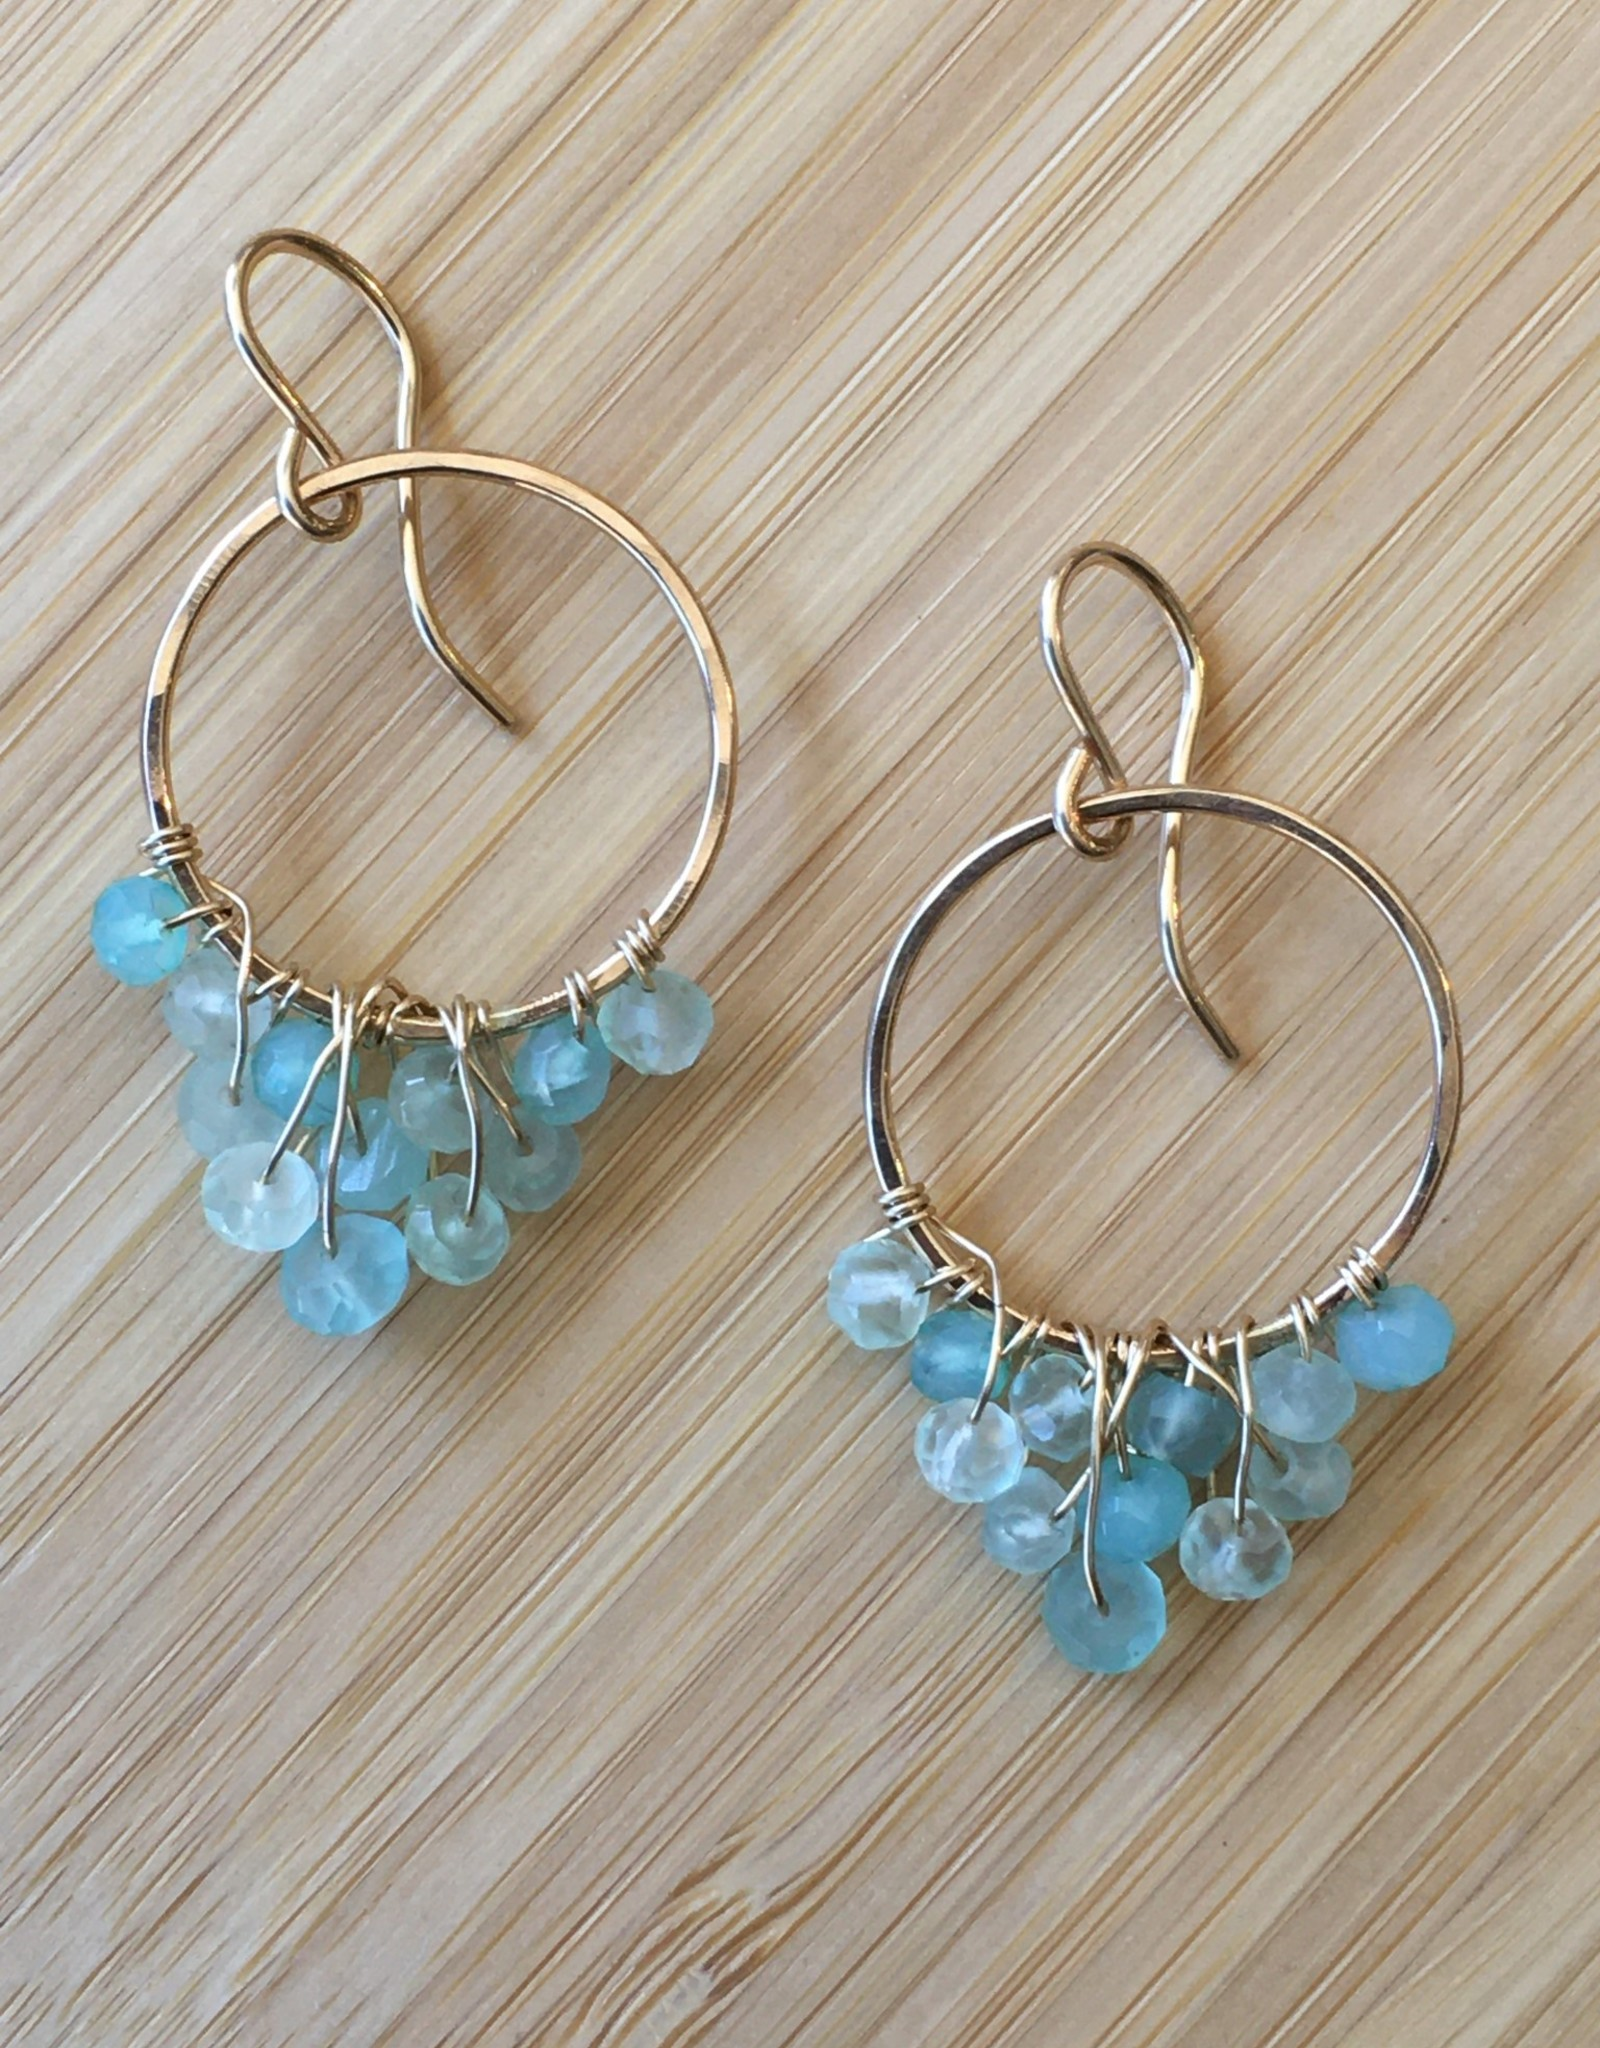 Cascading Hoop Earrings- Gold with Aqua Stone